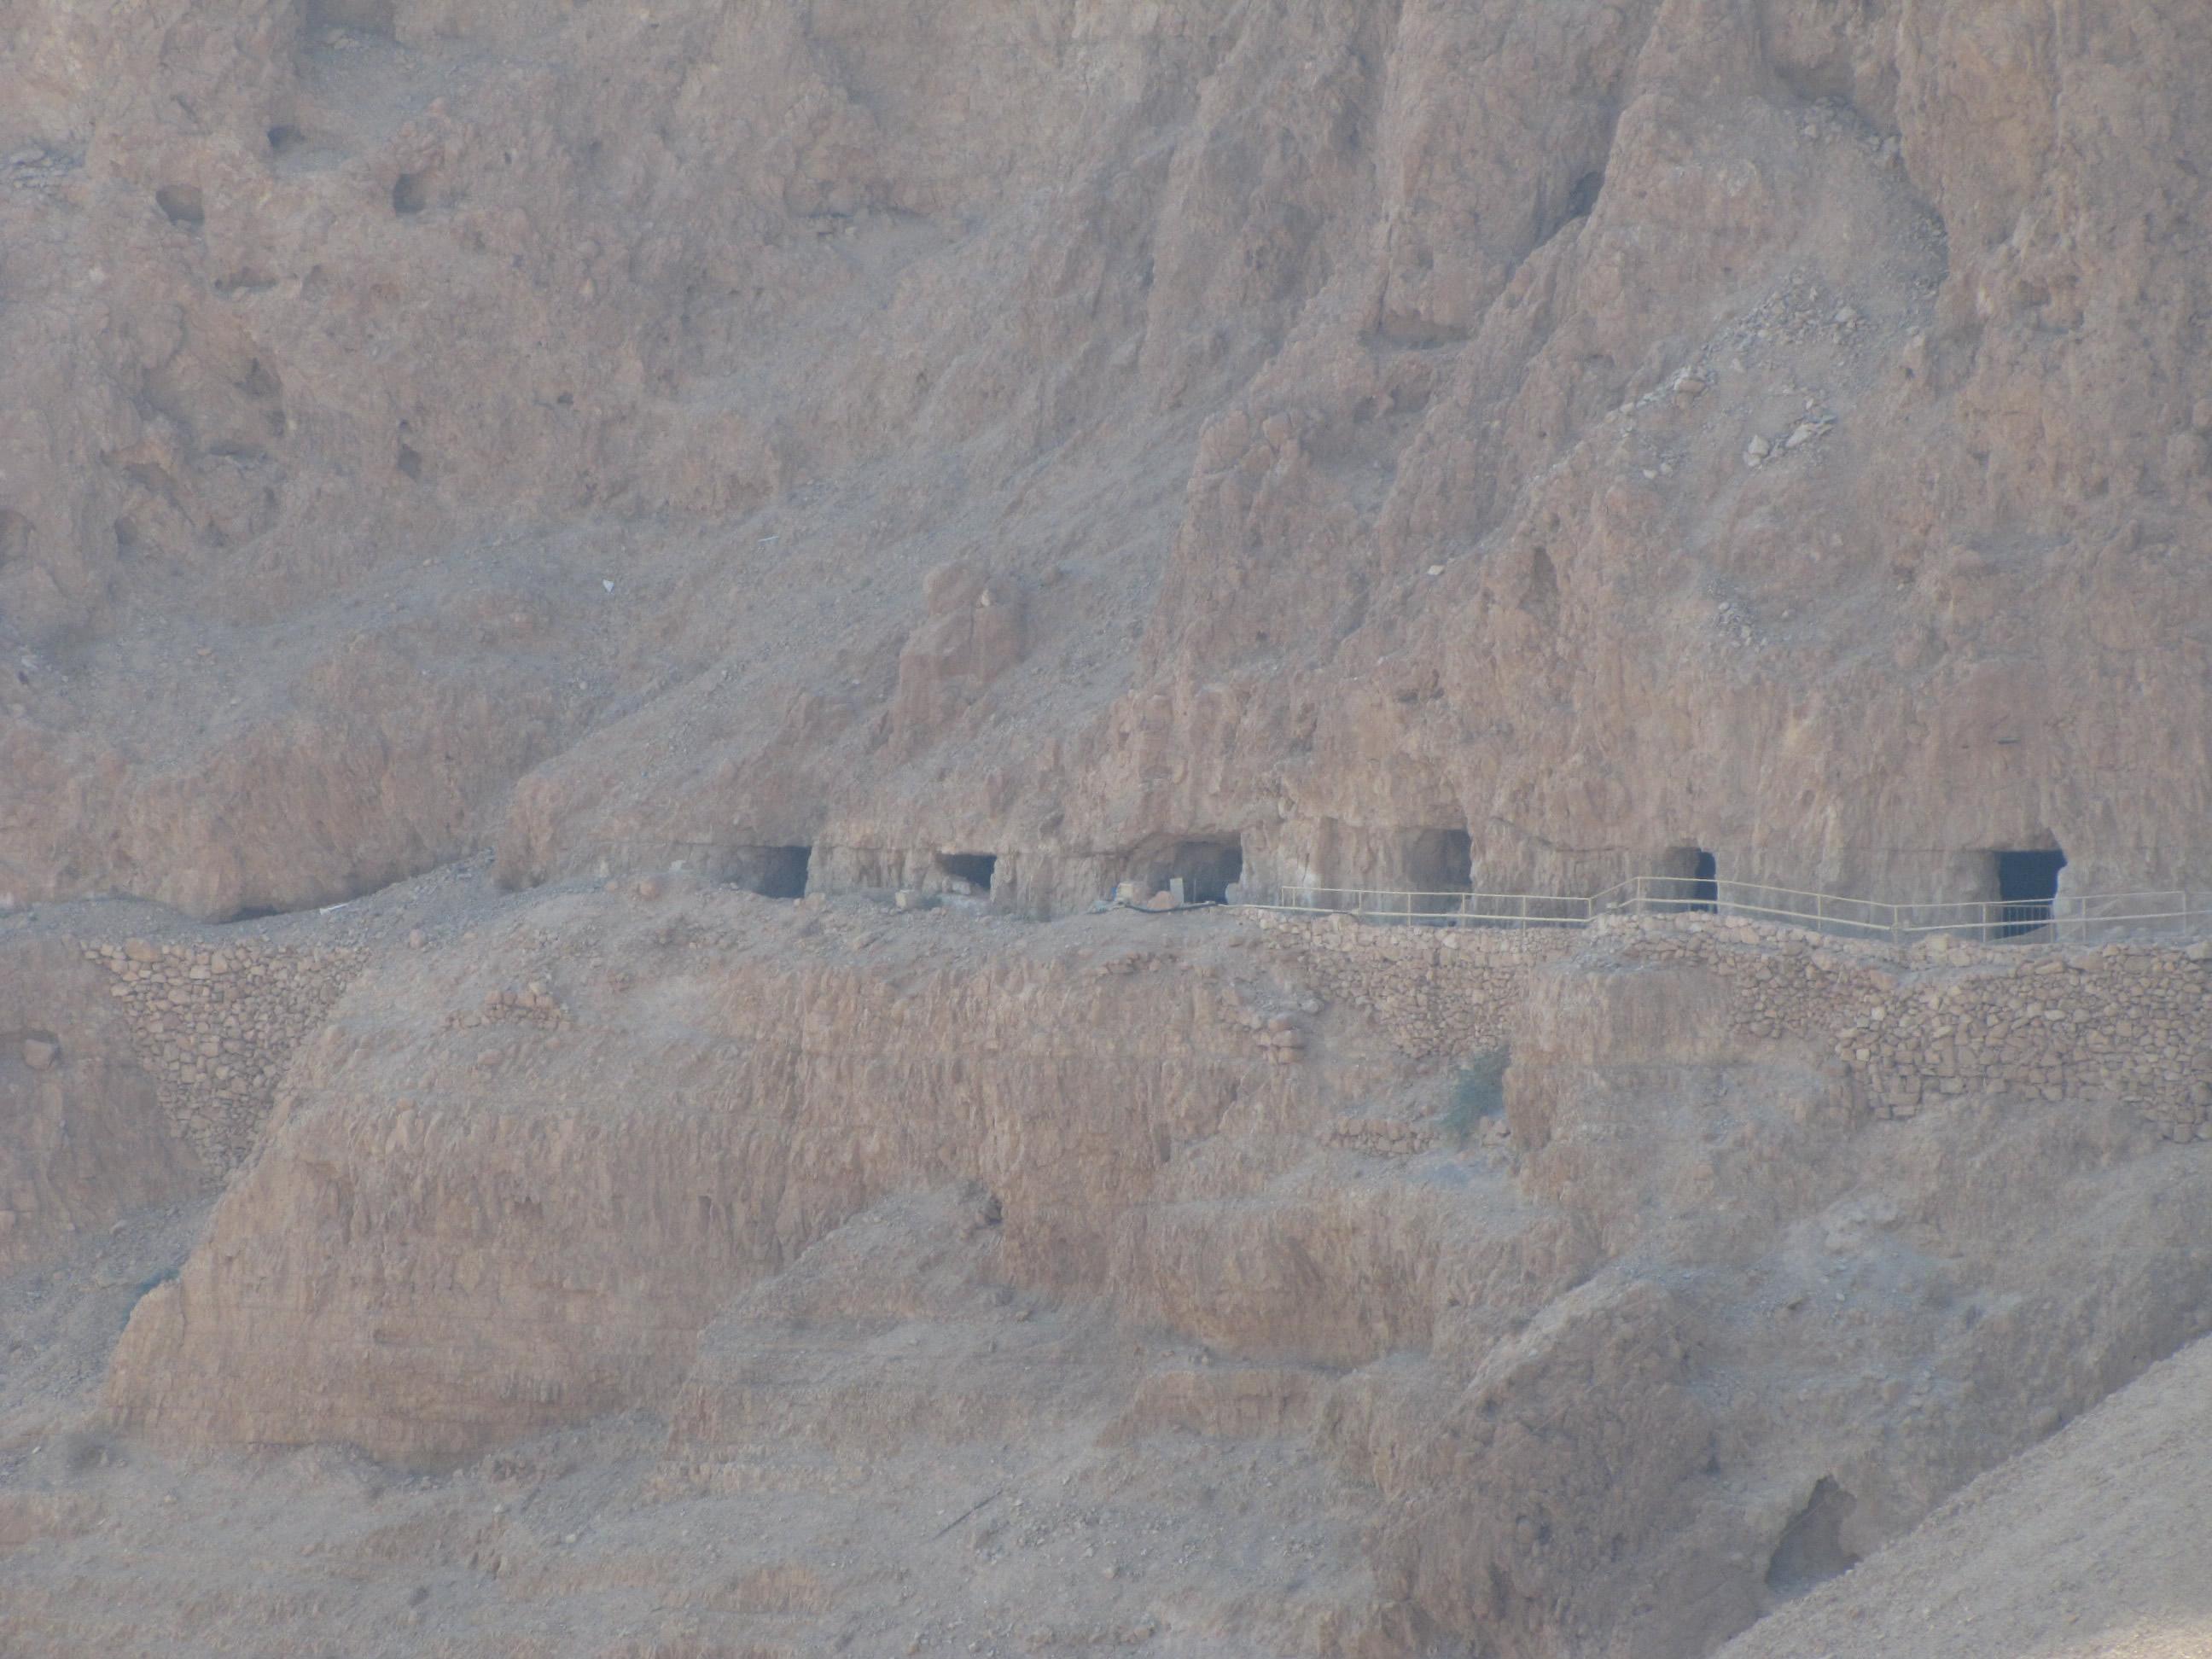 Masada - NET